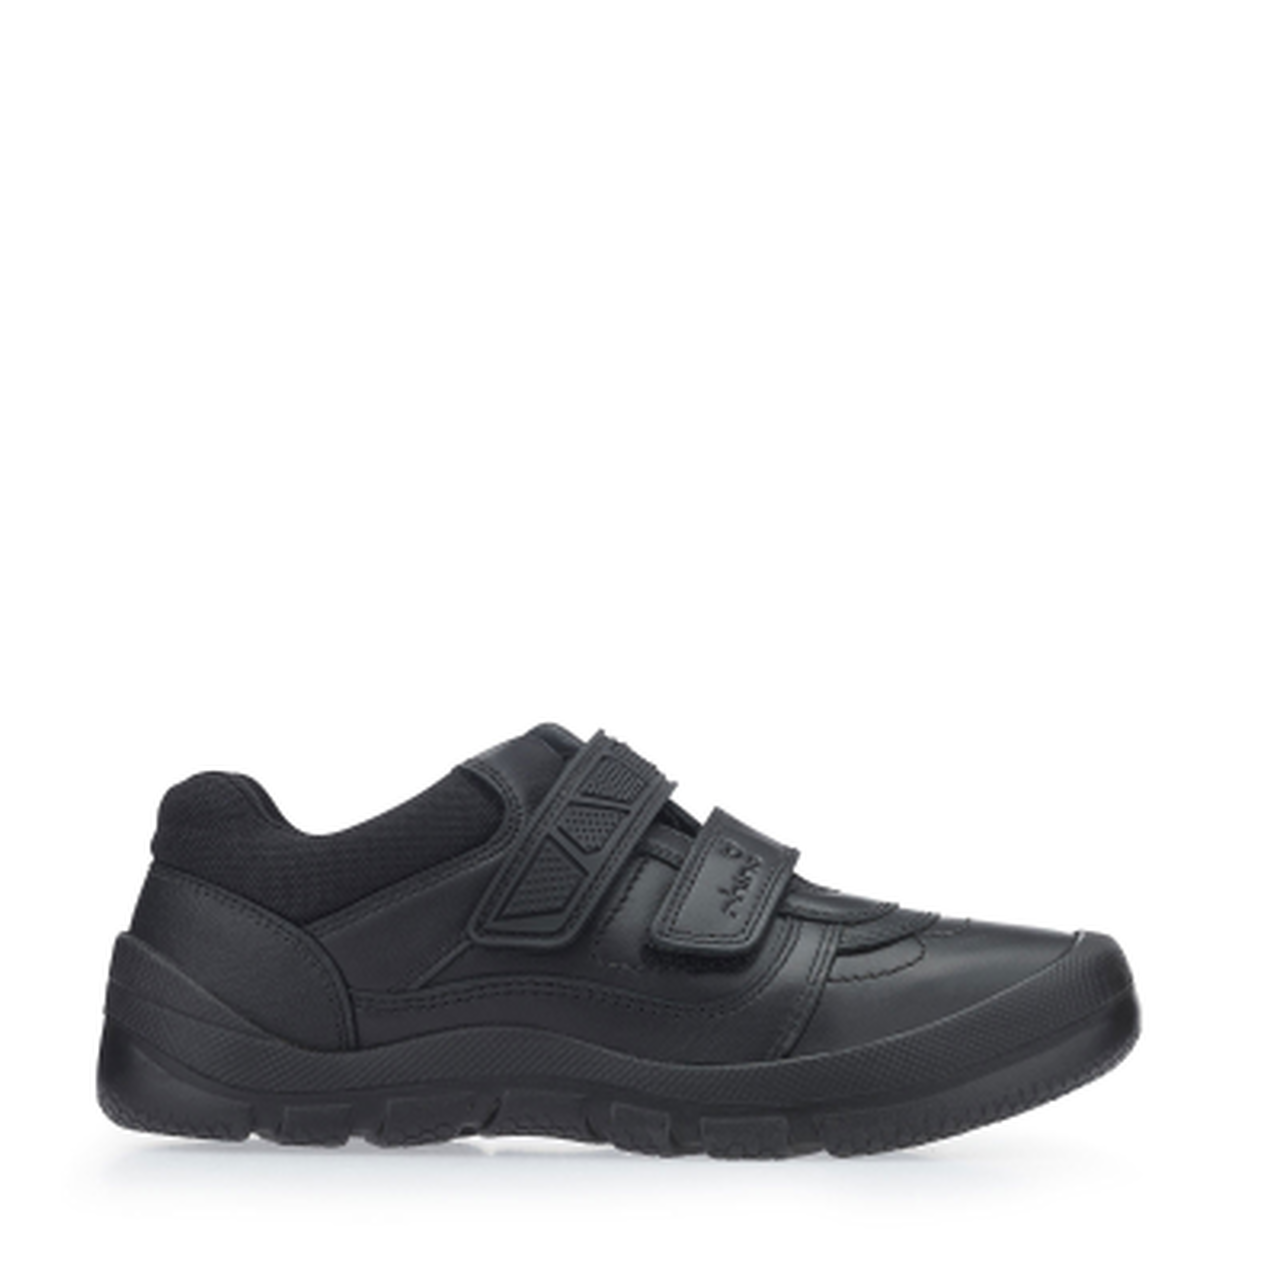 Start-rite Rhino Warrior black leather school shoe